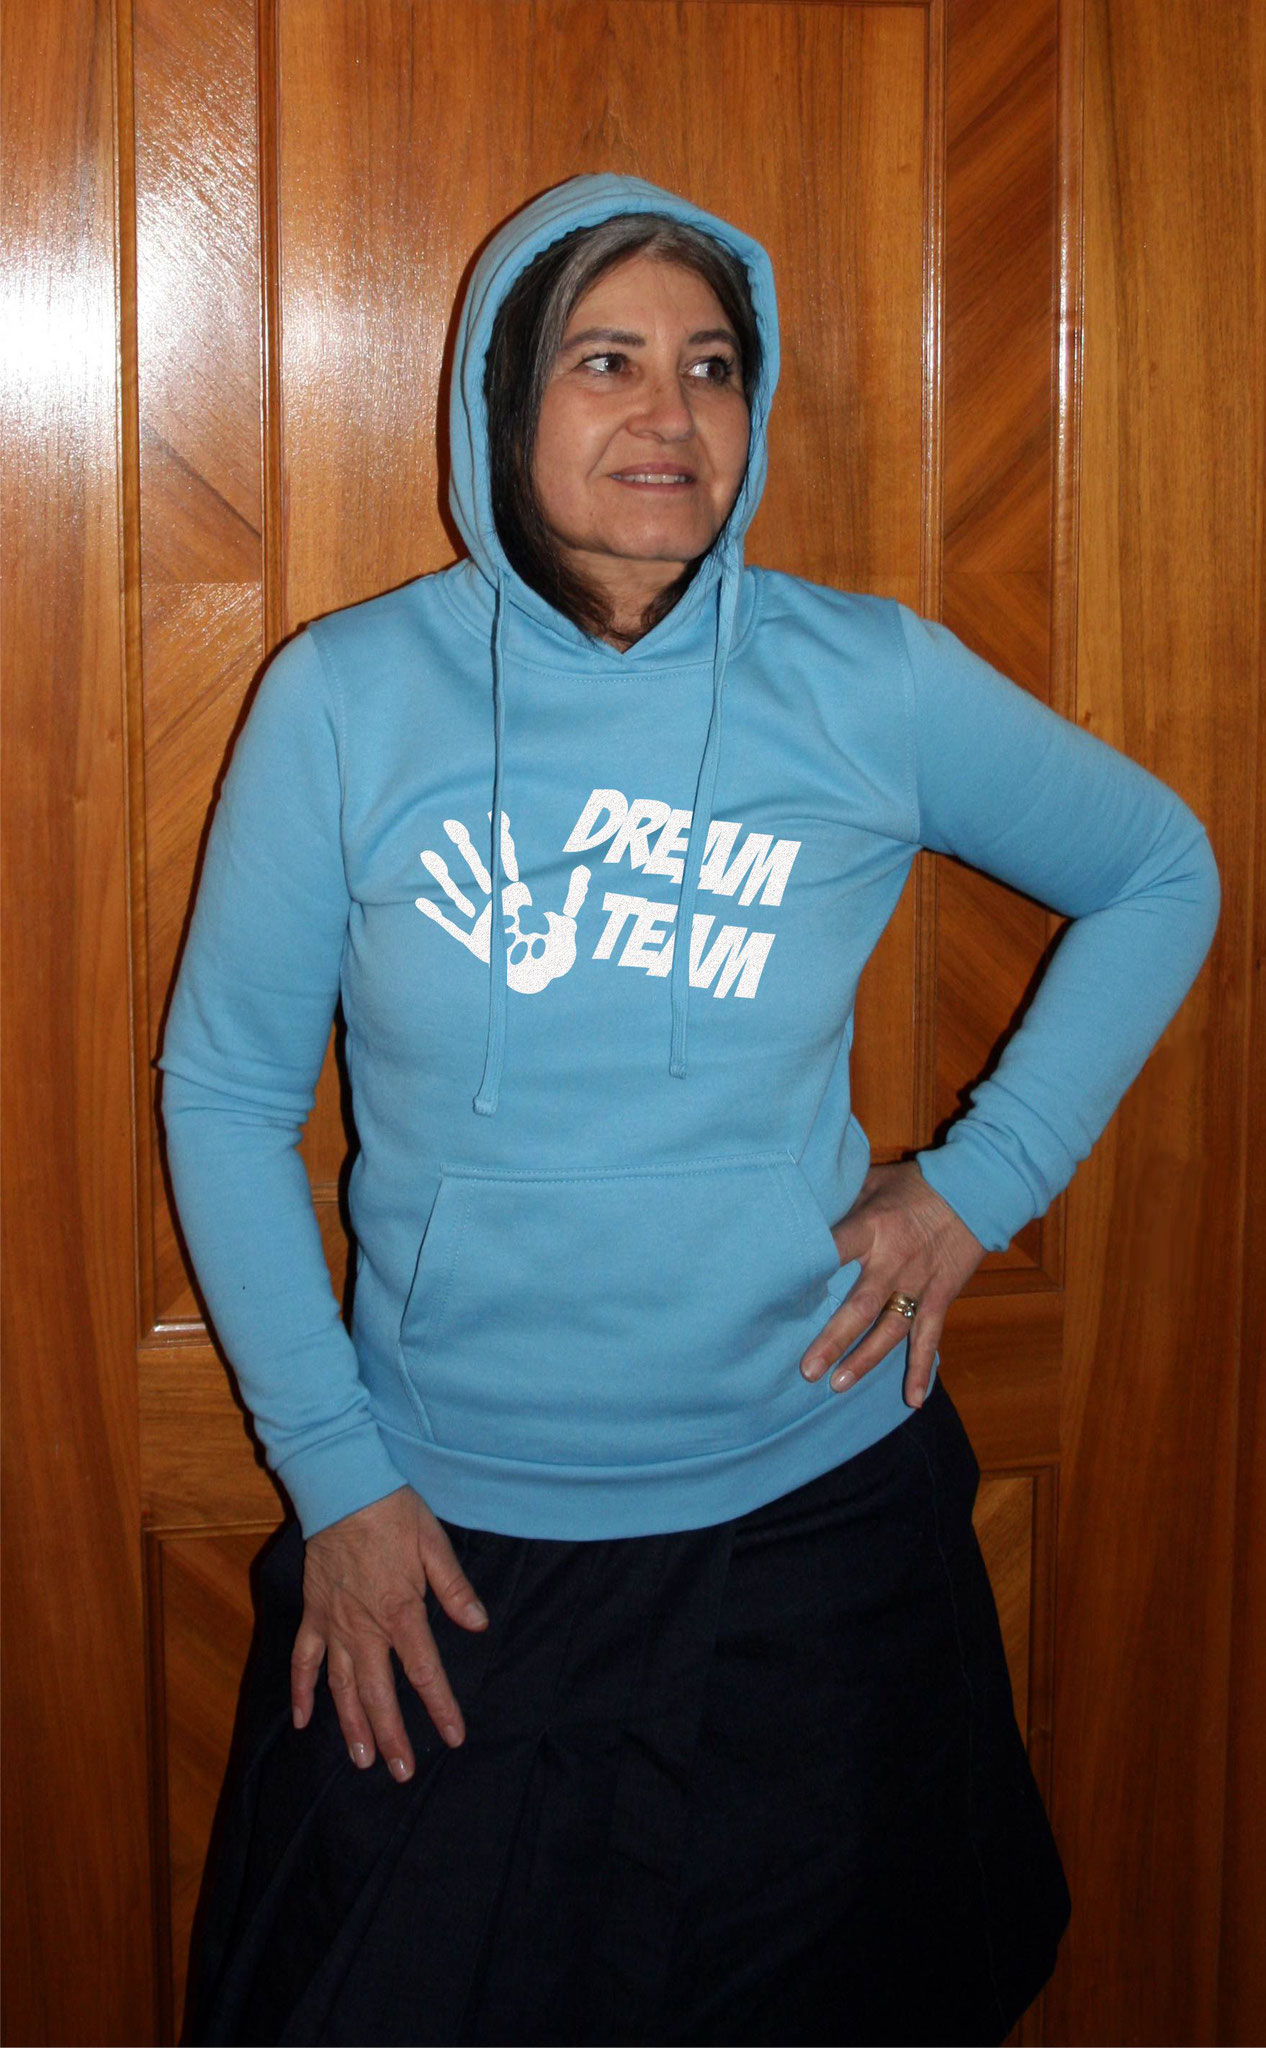 "Damen-Sweater sky blue mit Motiv ""DREAM TEAM"""